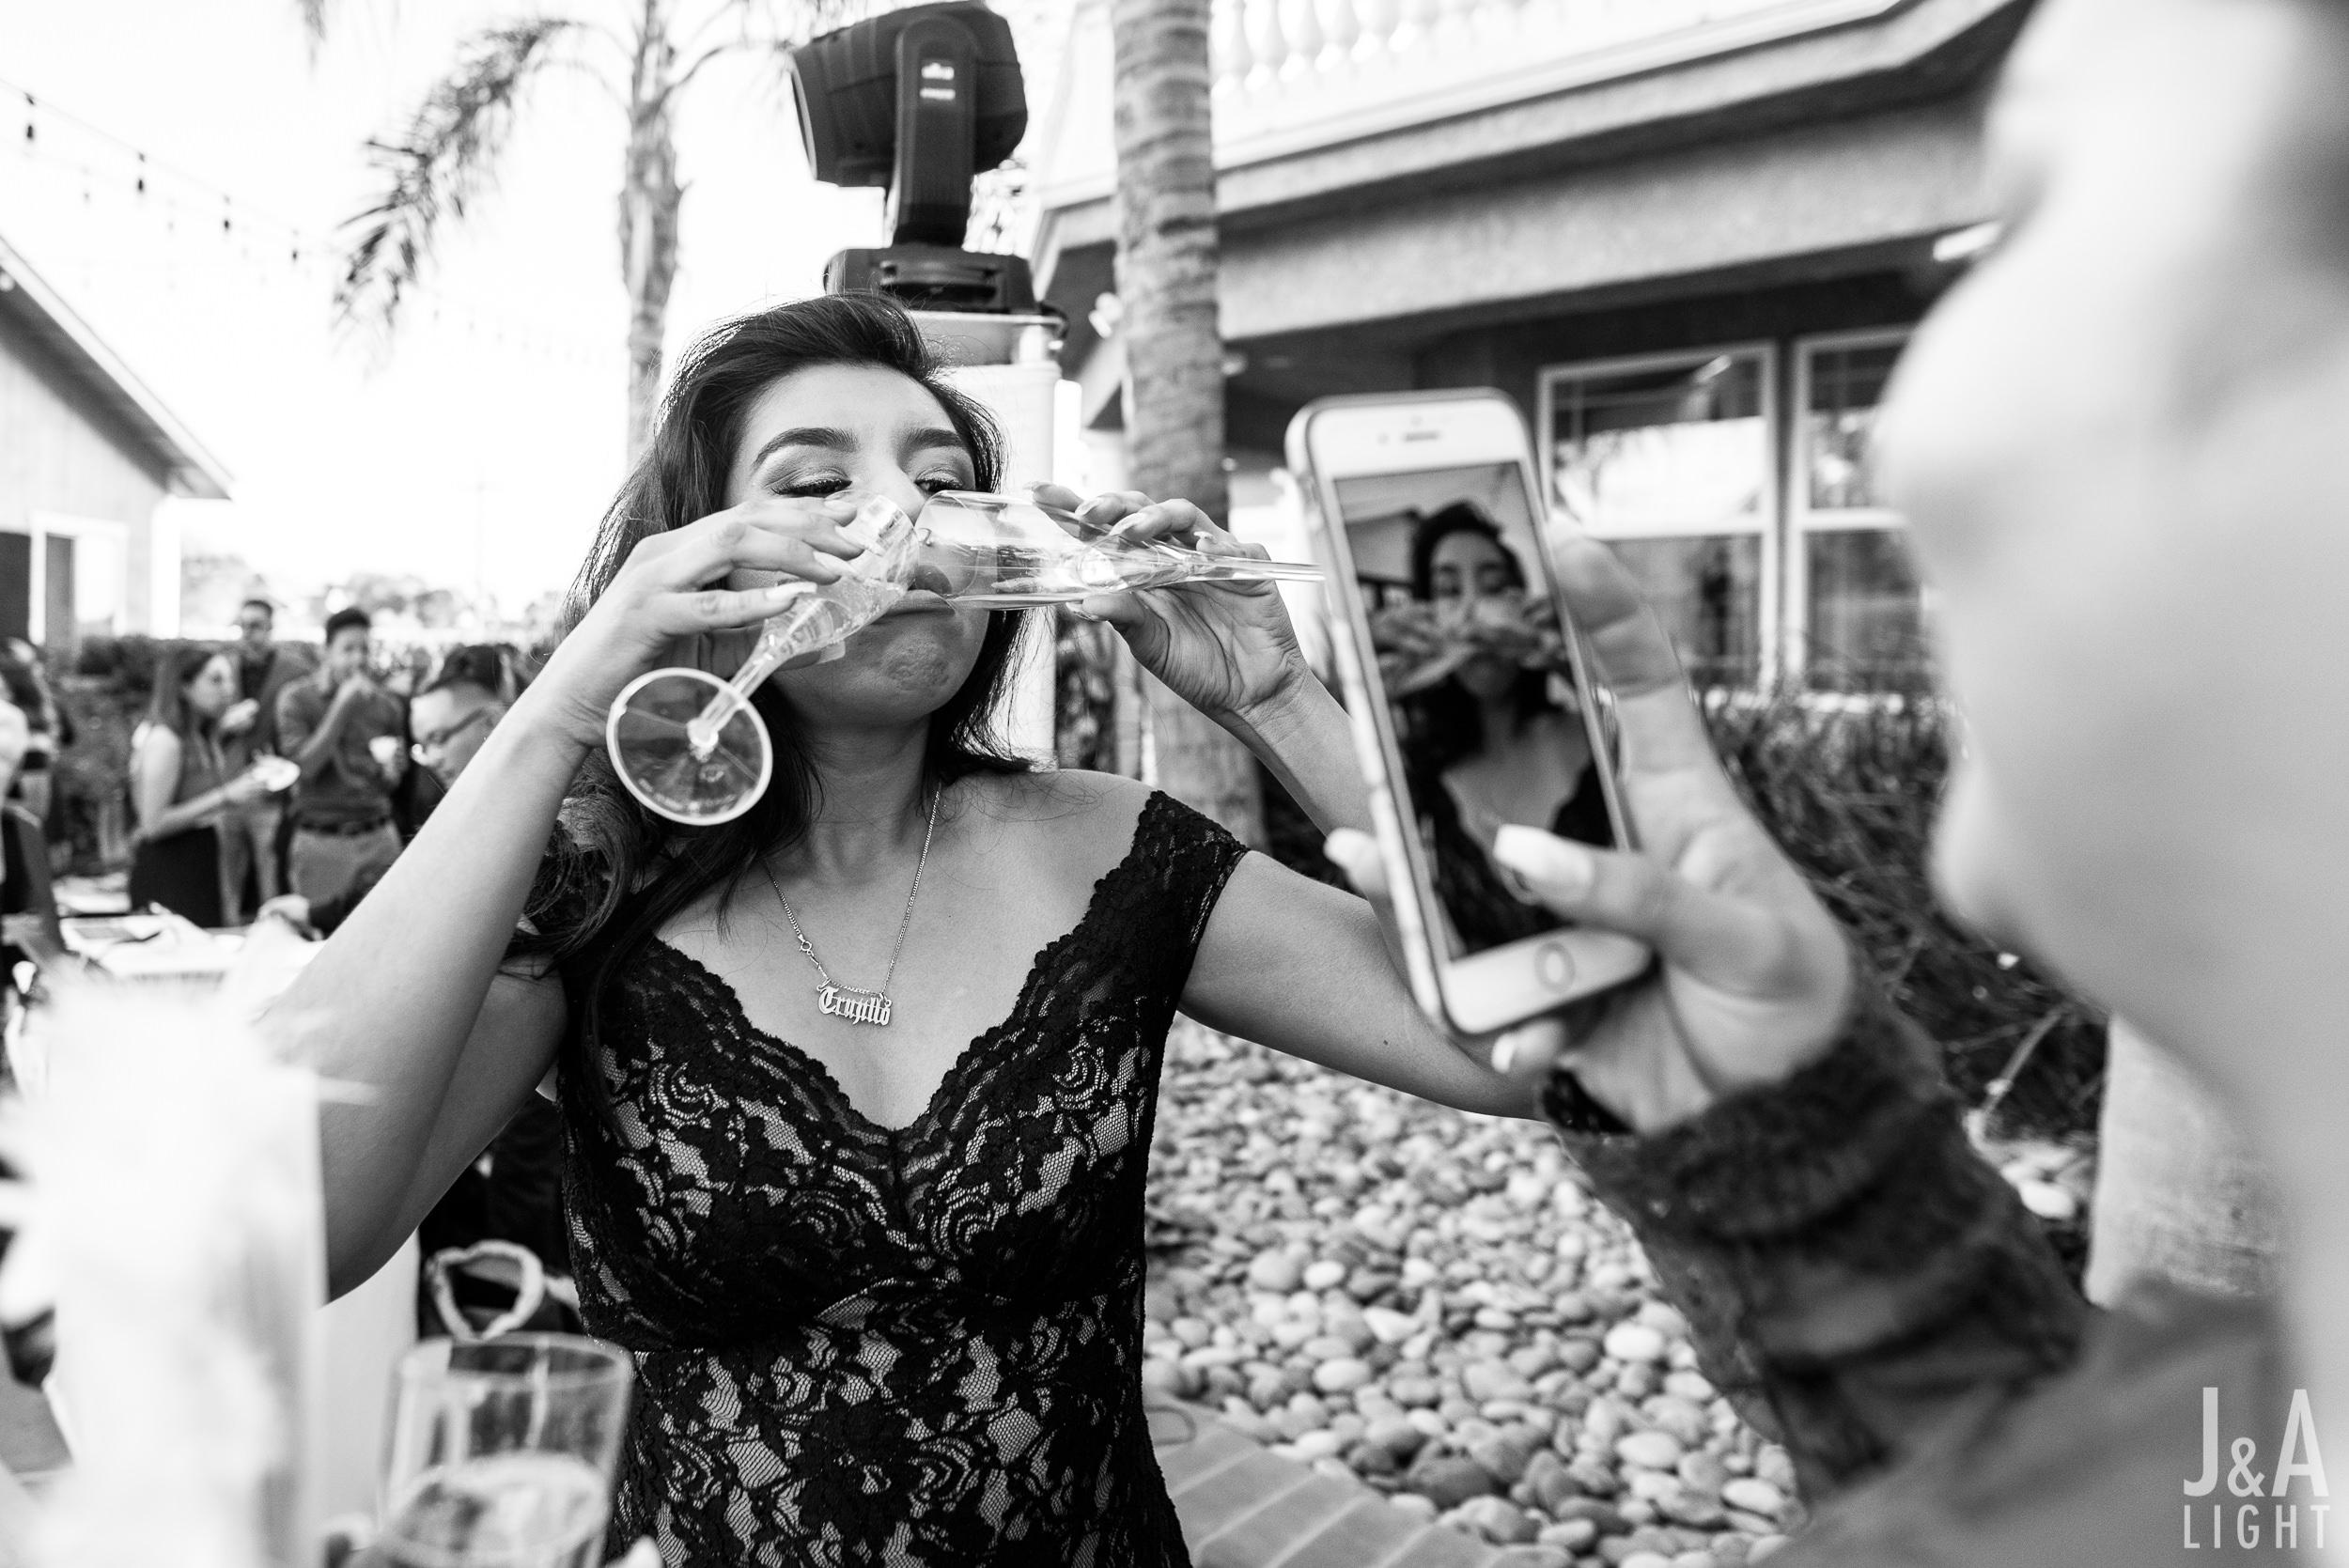 20171014-JanDan-LosBanos-GlassMansion-Wedding-Blog-054.jpg